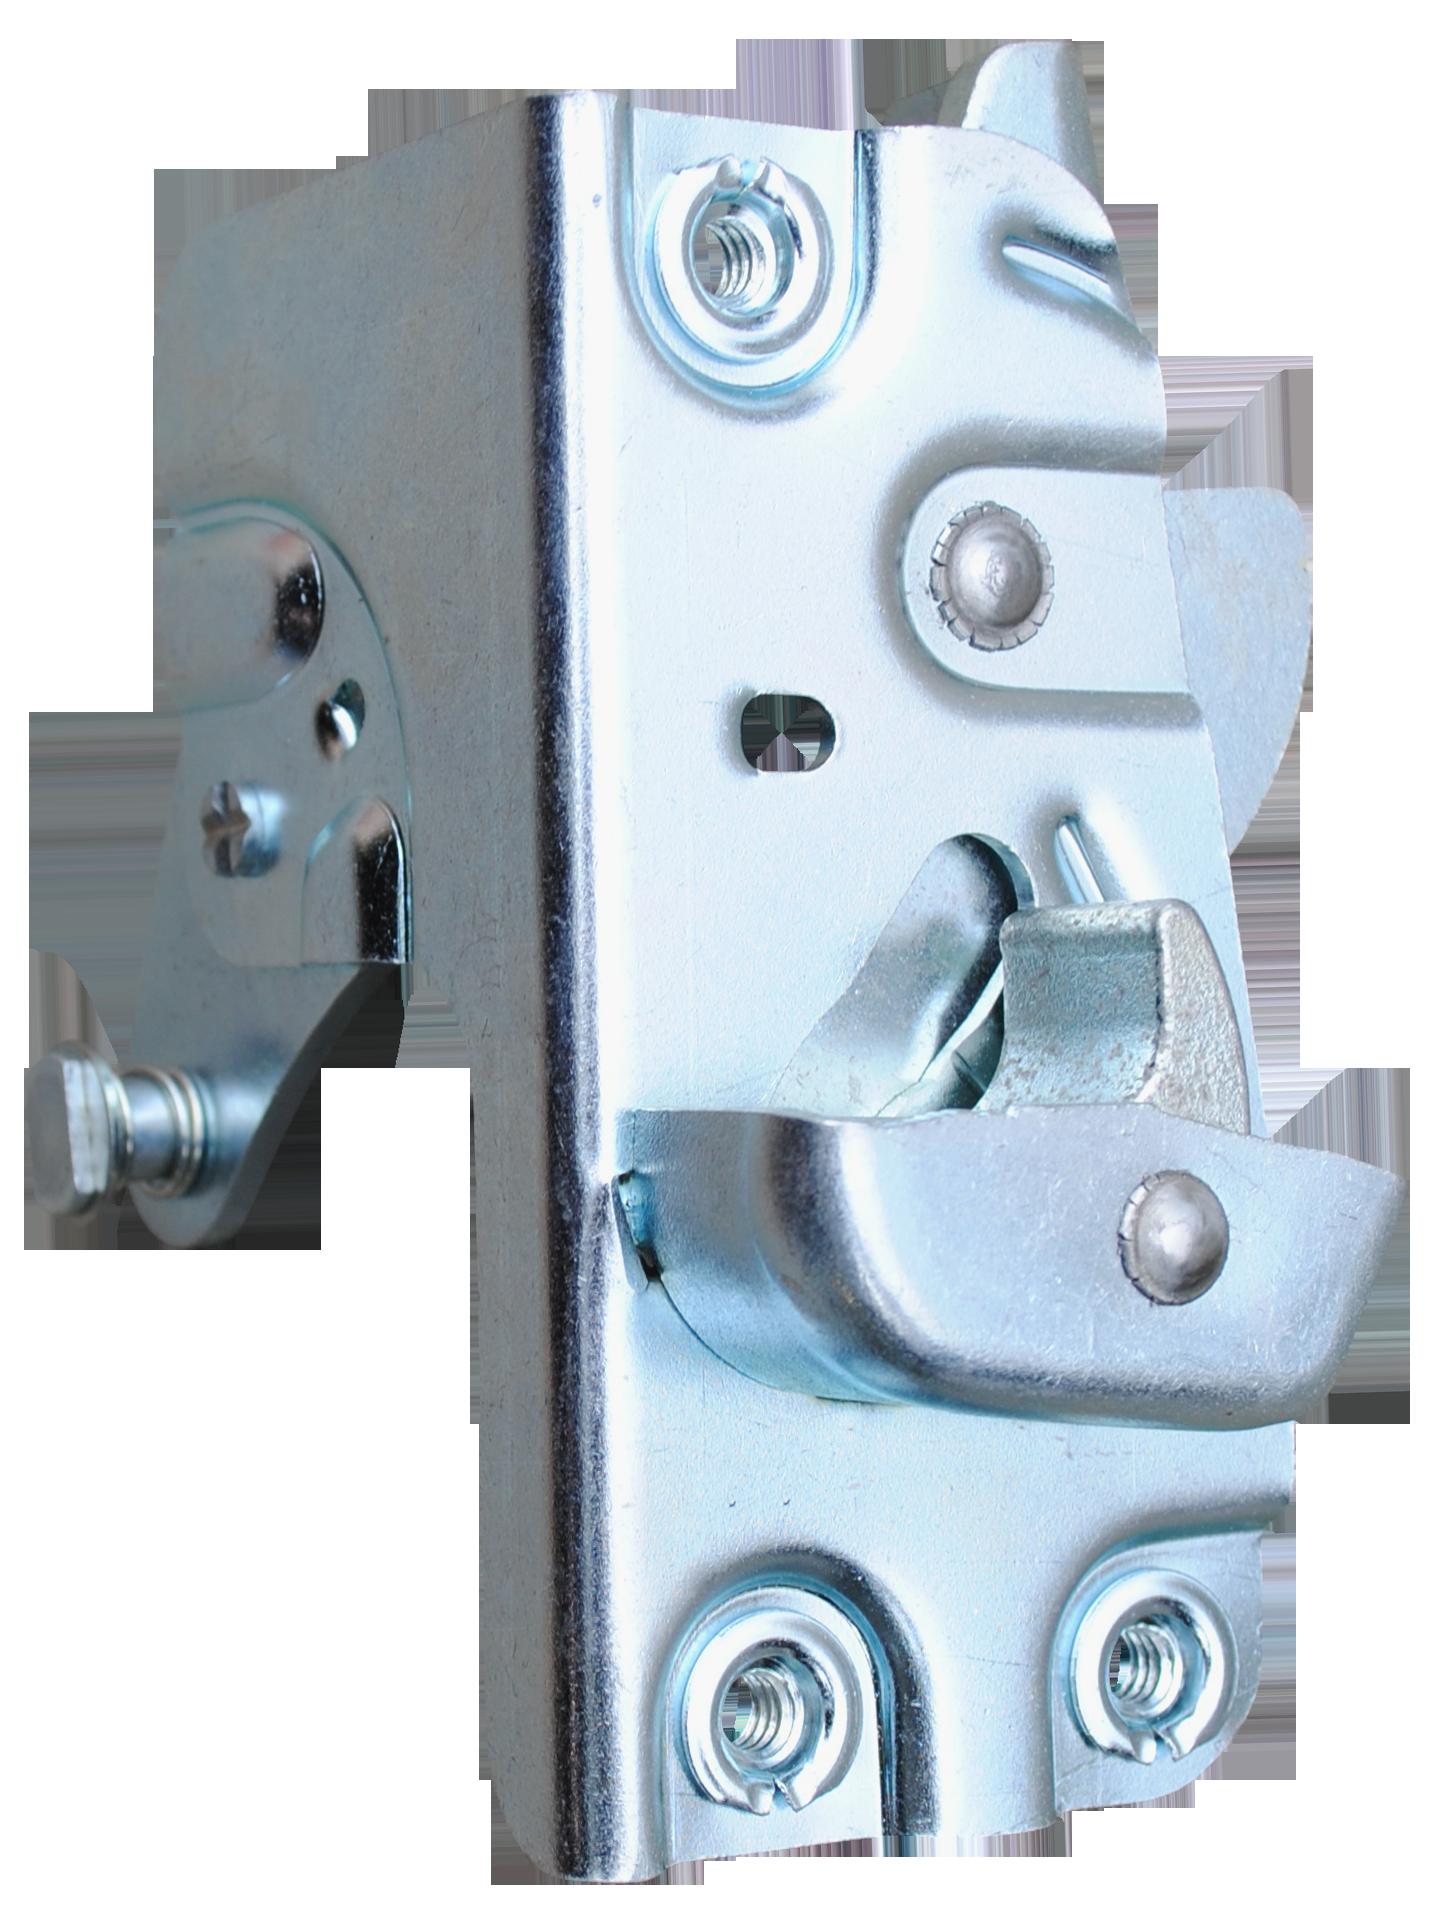 1952-55 C10 door latch assembly 1st design 3100/3600